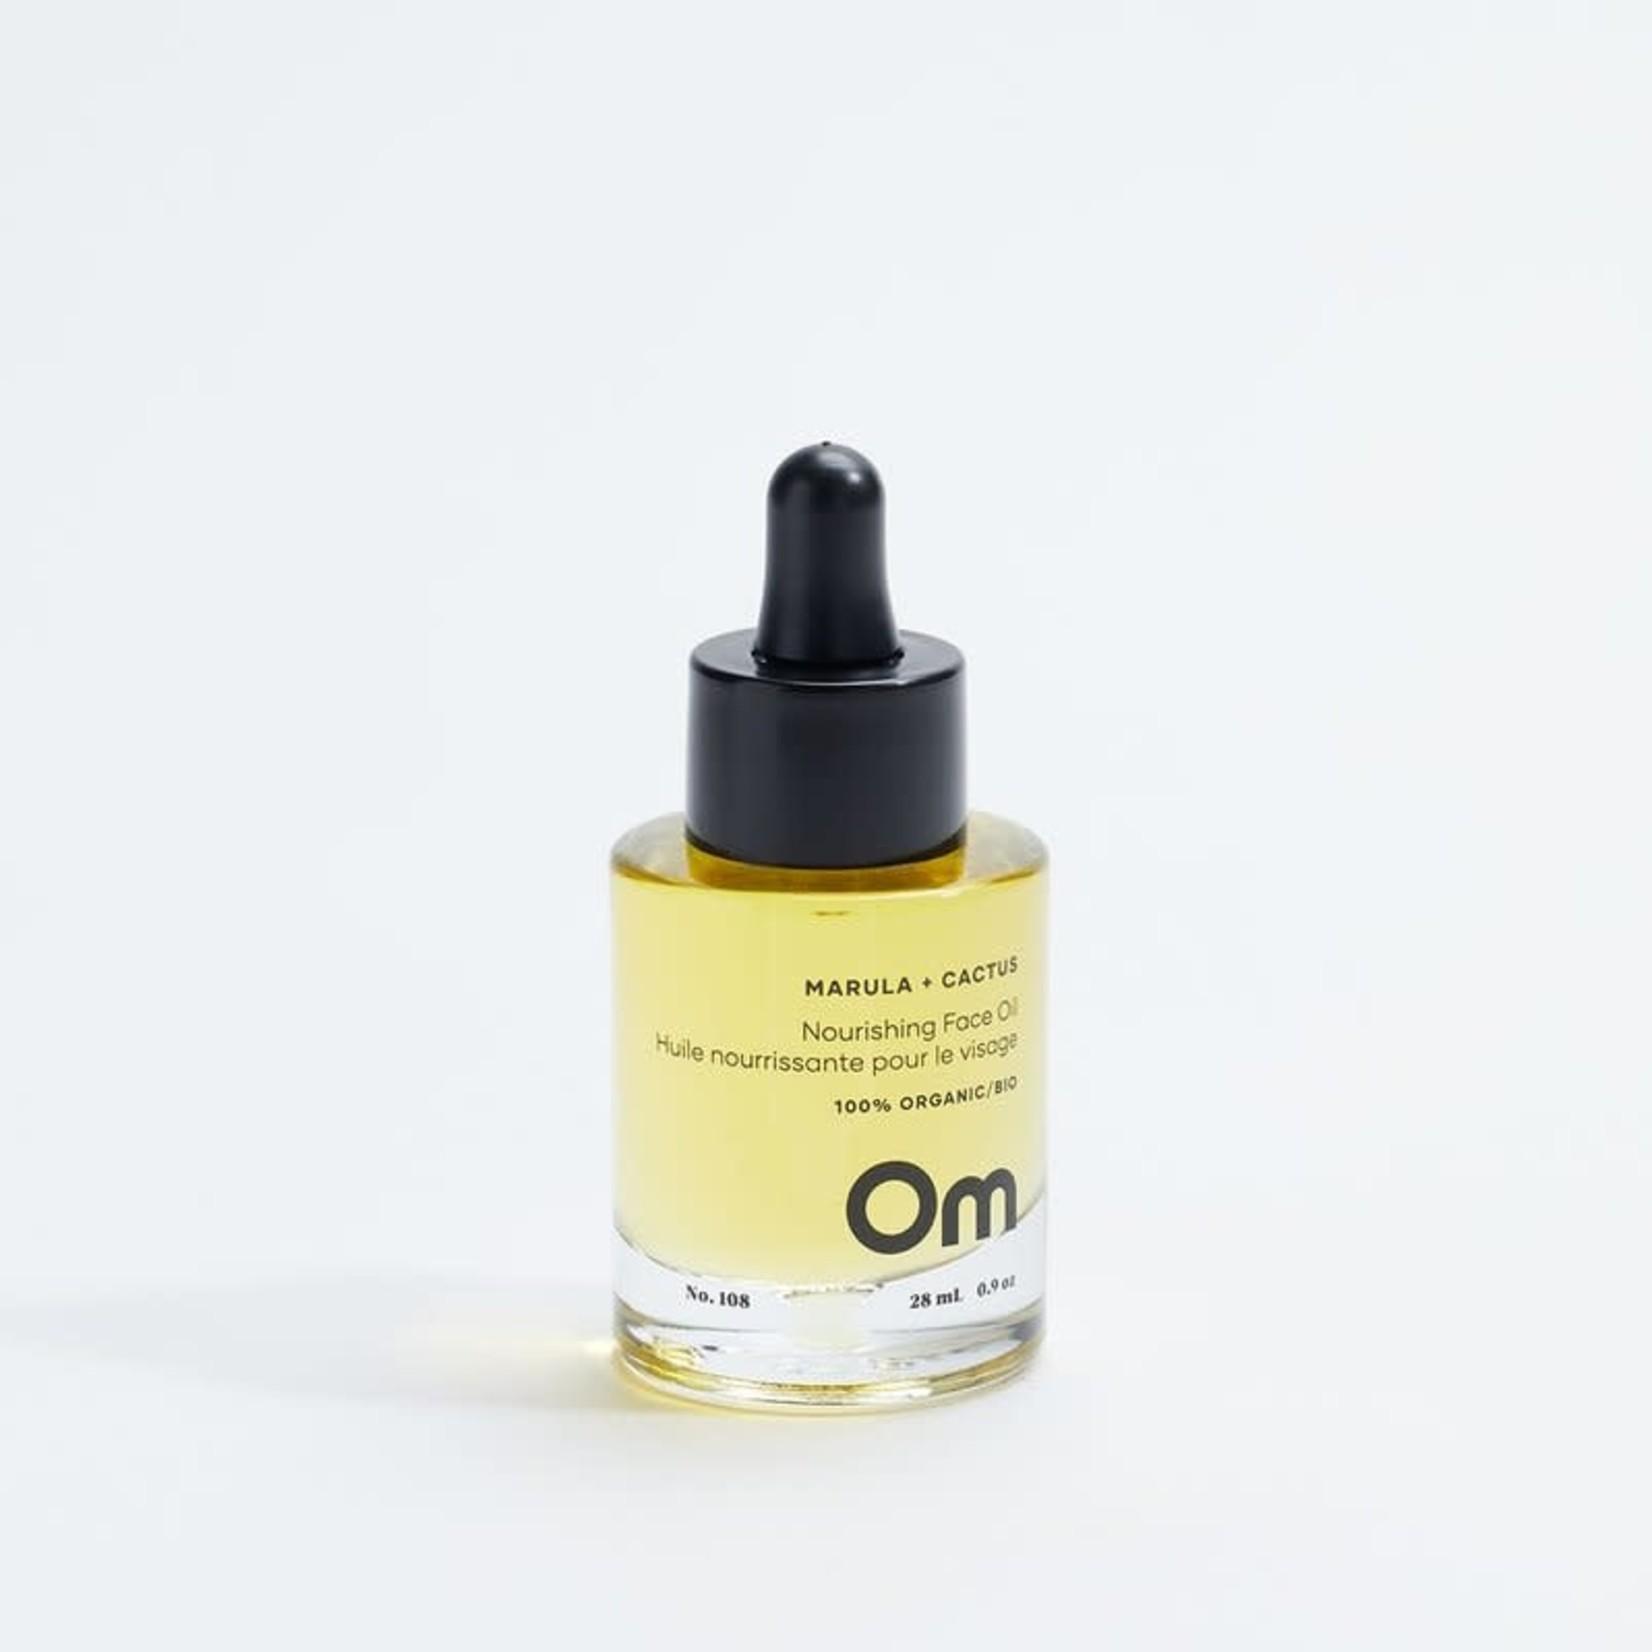 om organics Marula + Cactus Nourishing Face Oil